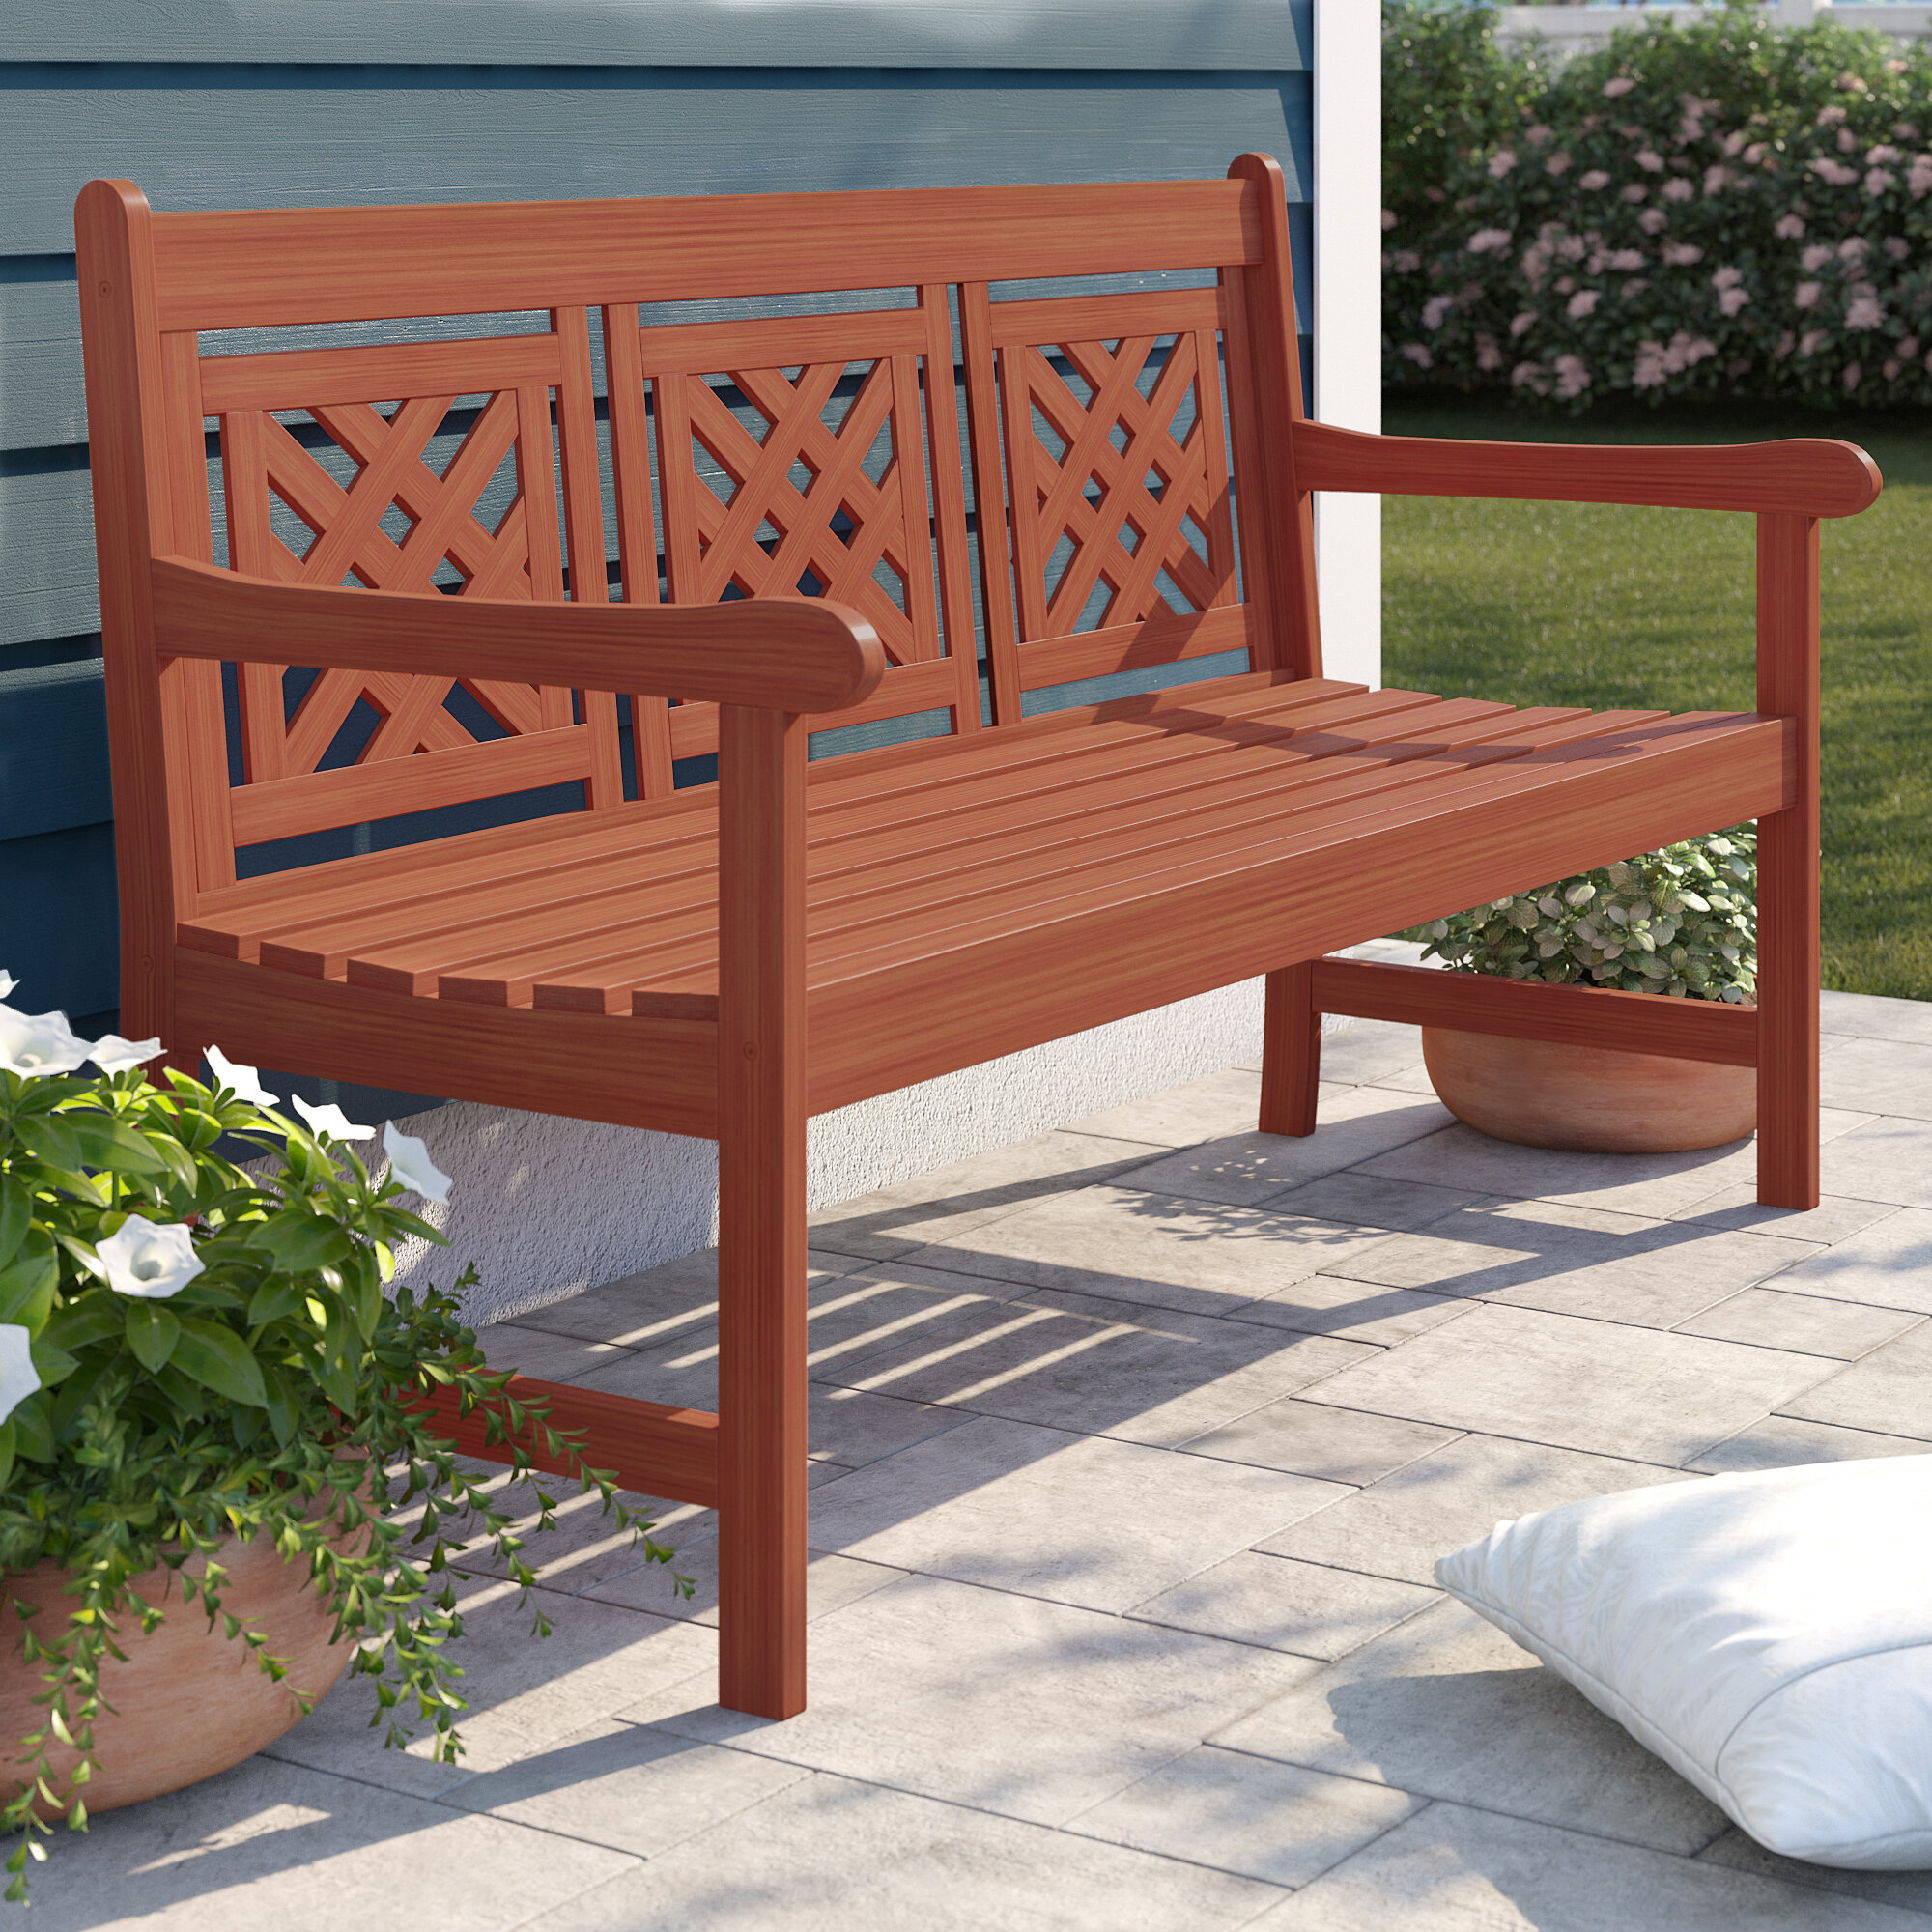 Amabel Patio Plaid Wooden Garden Bench Pertaining To Amabel Wooden Garden Benches (View 3 of 25)